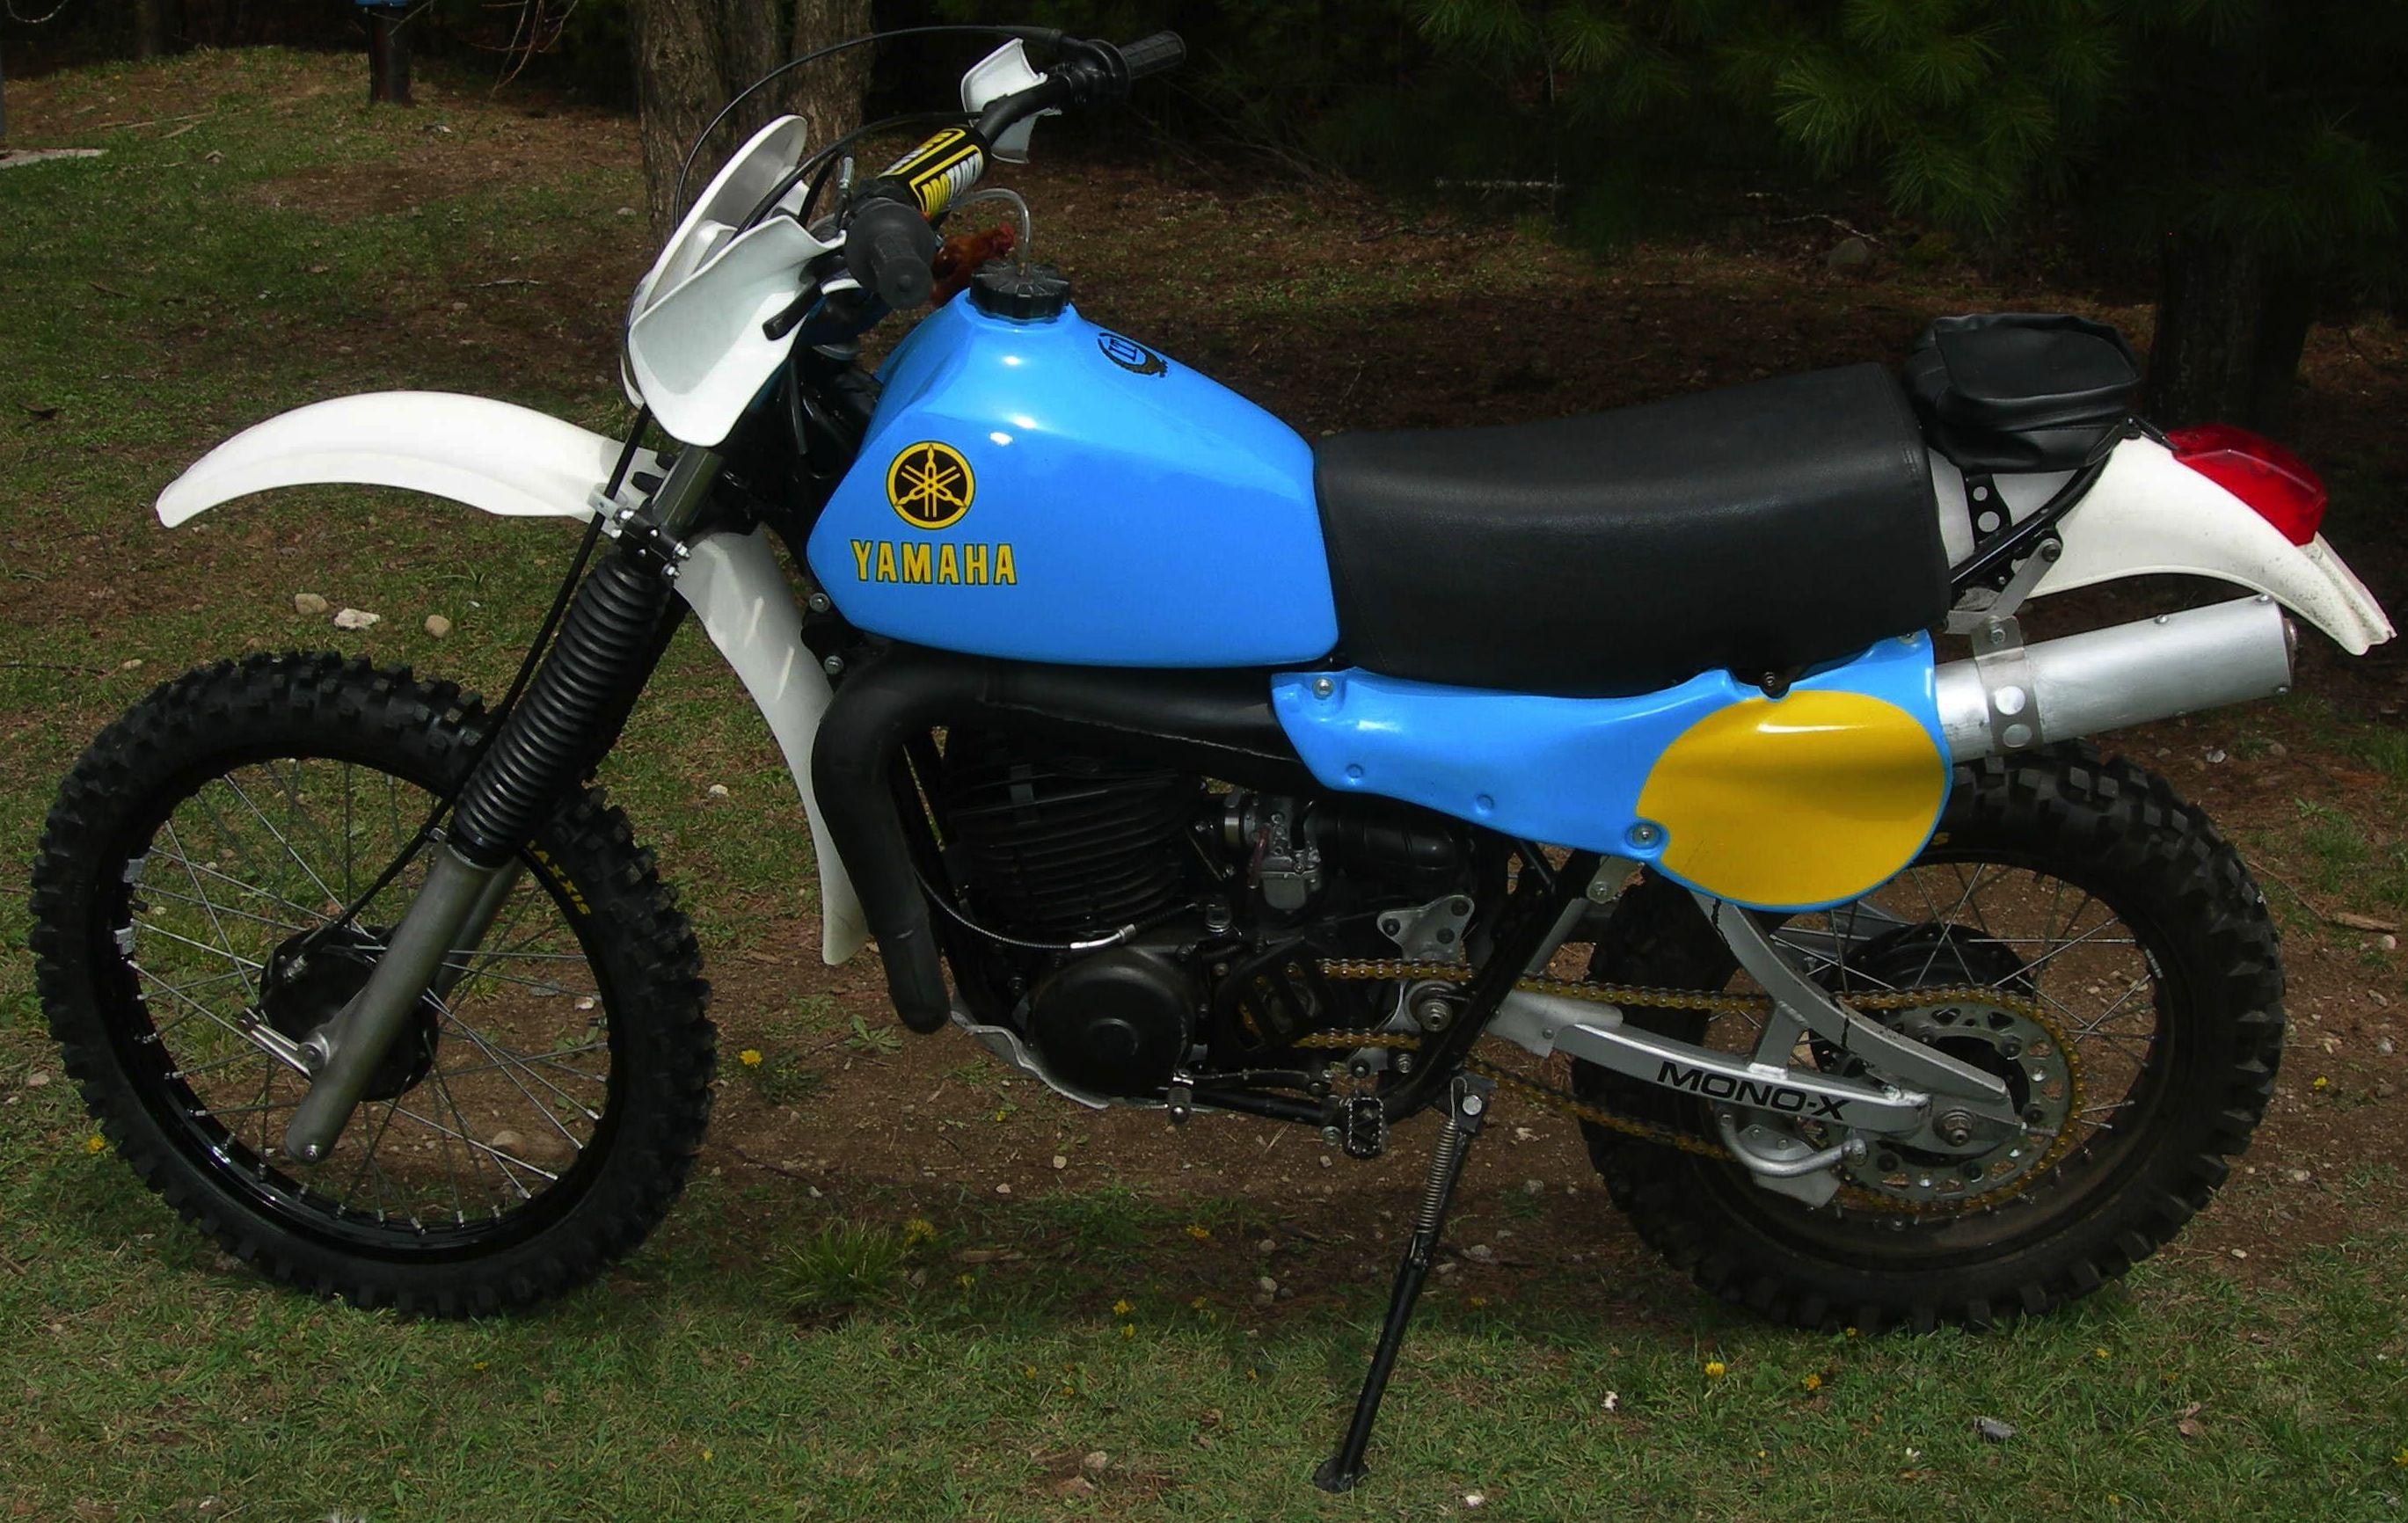 The 1978 Yamaha IT 400 endure dirt bike had a powerful